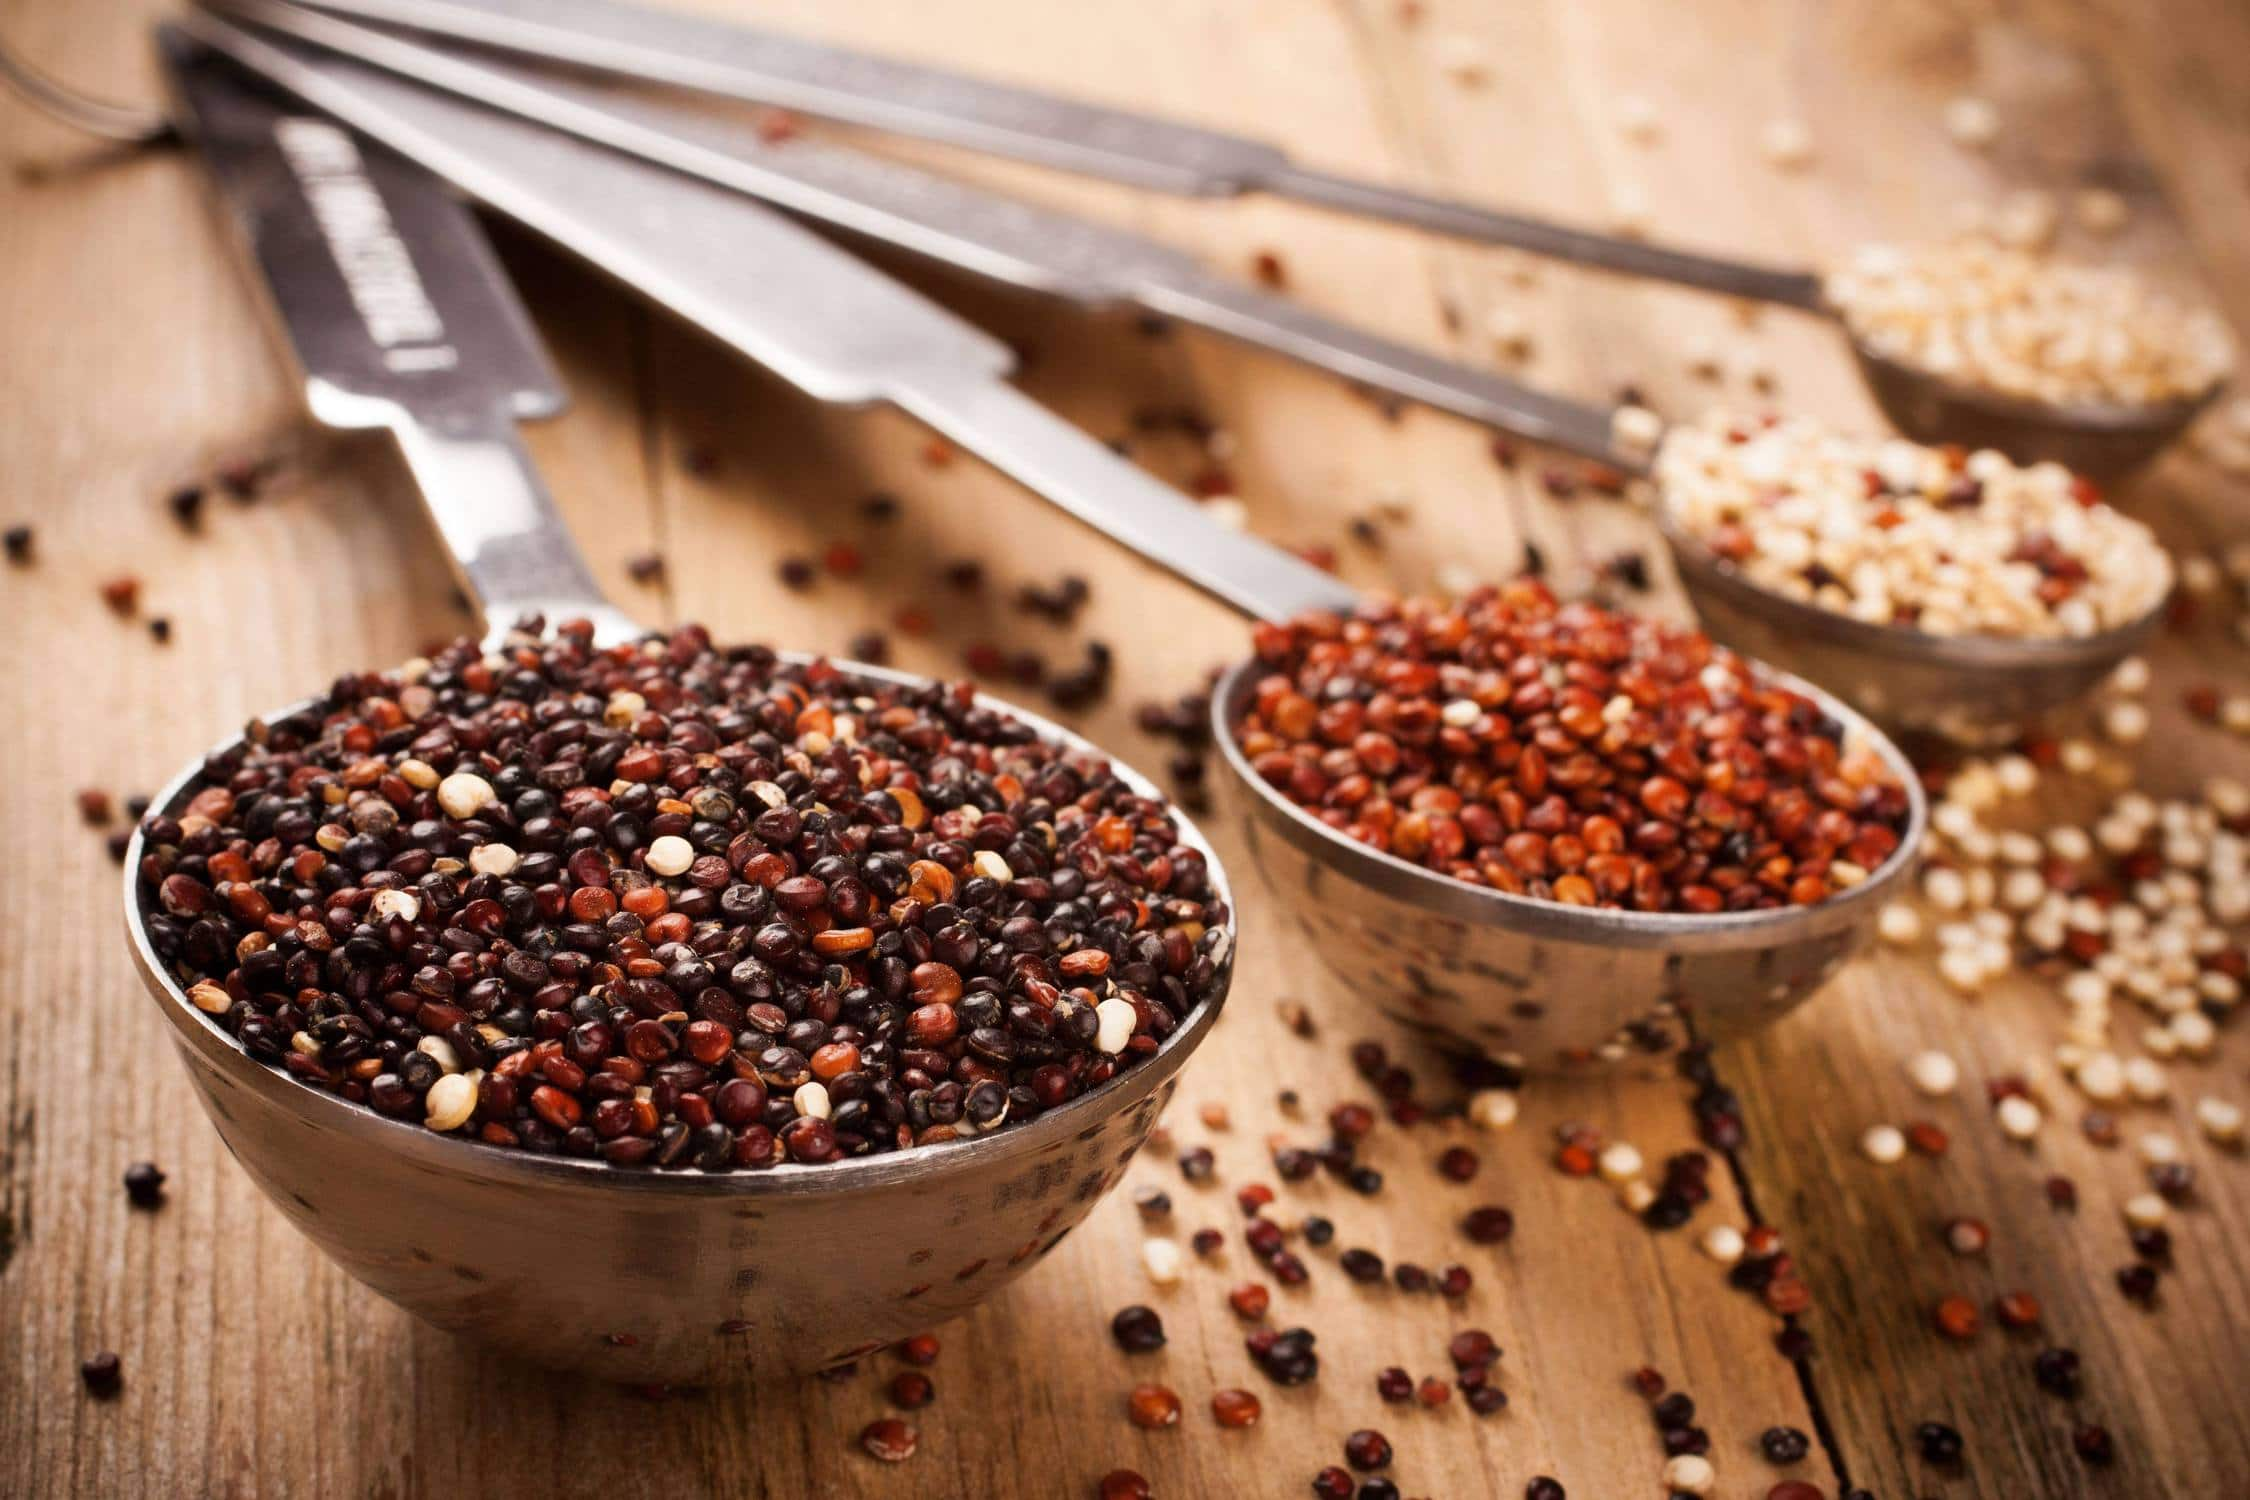 Feeding dogs quinoa